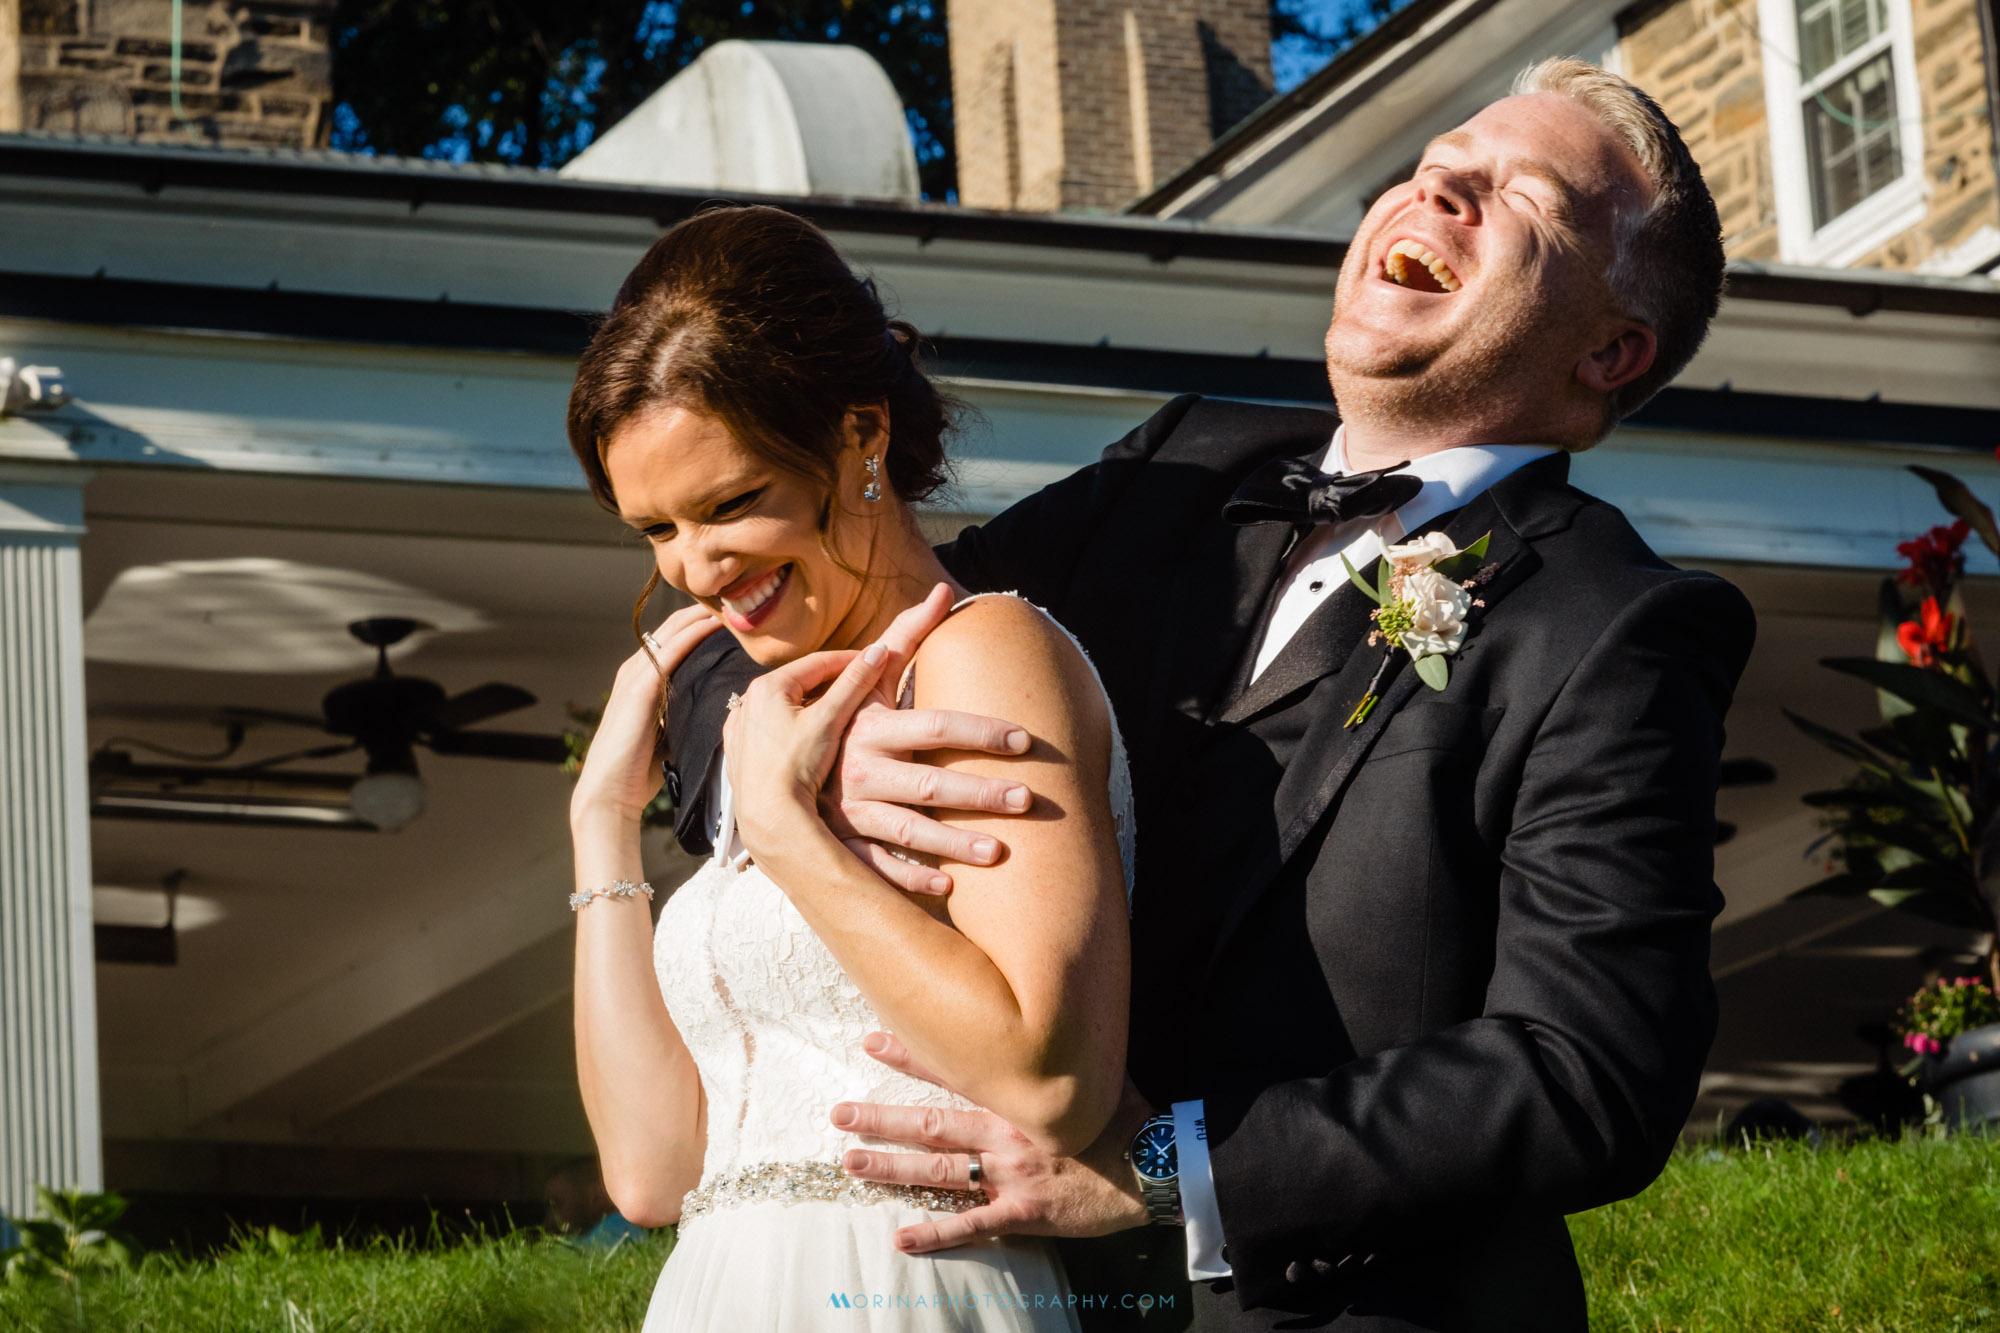 Colleen & Bill Wedding at Manufacturers' Golf & Country Club wedding 0056.jpg